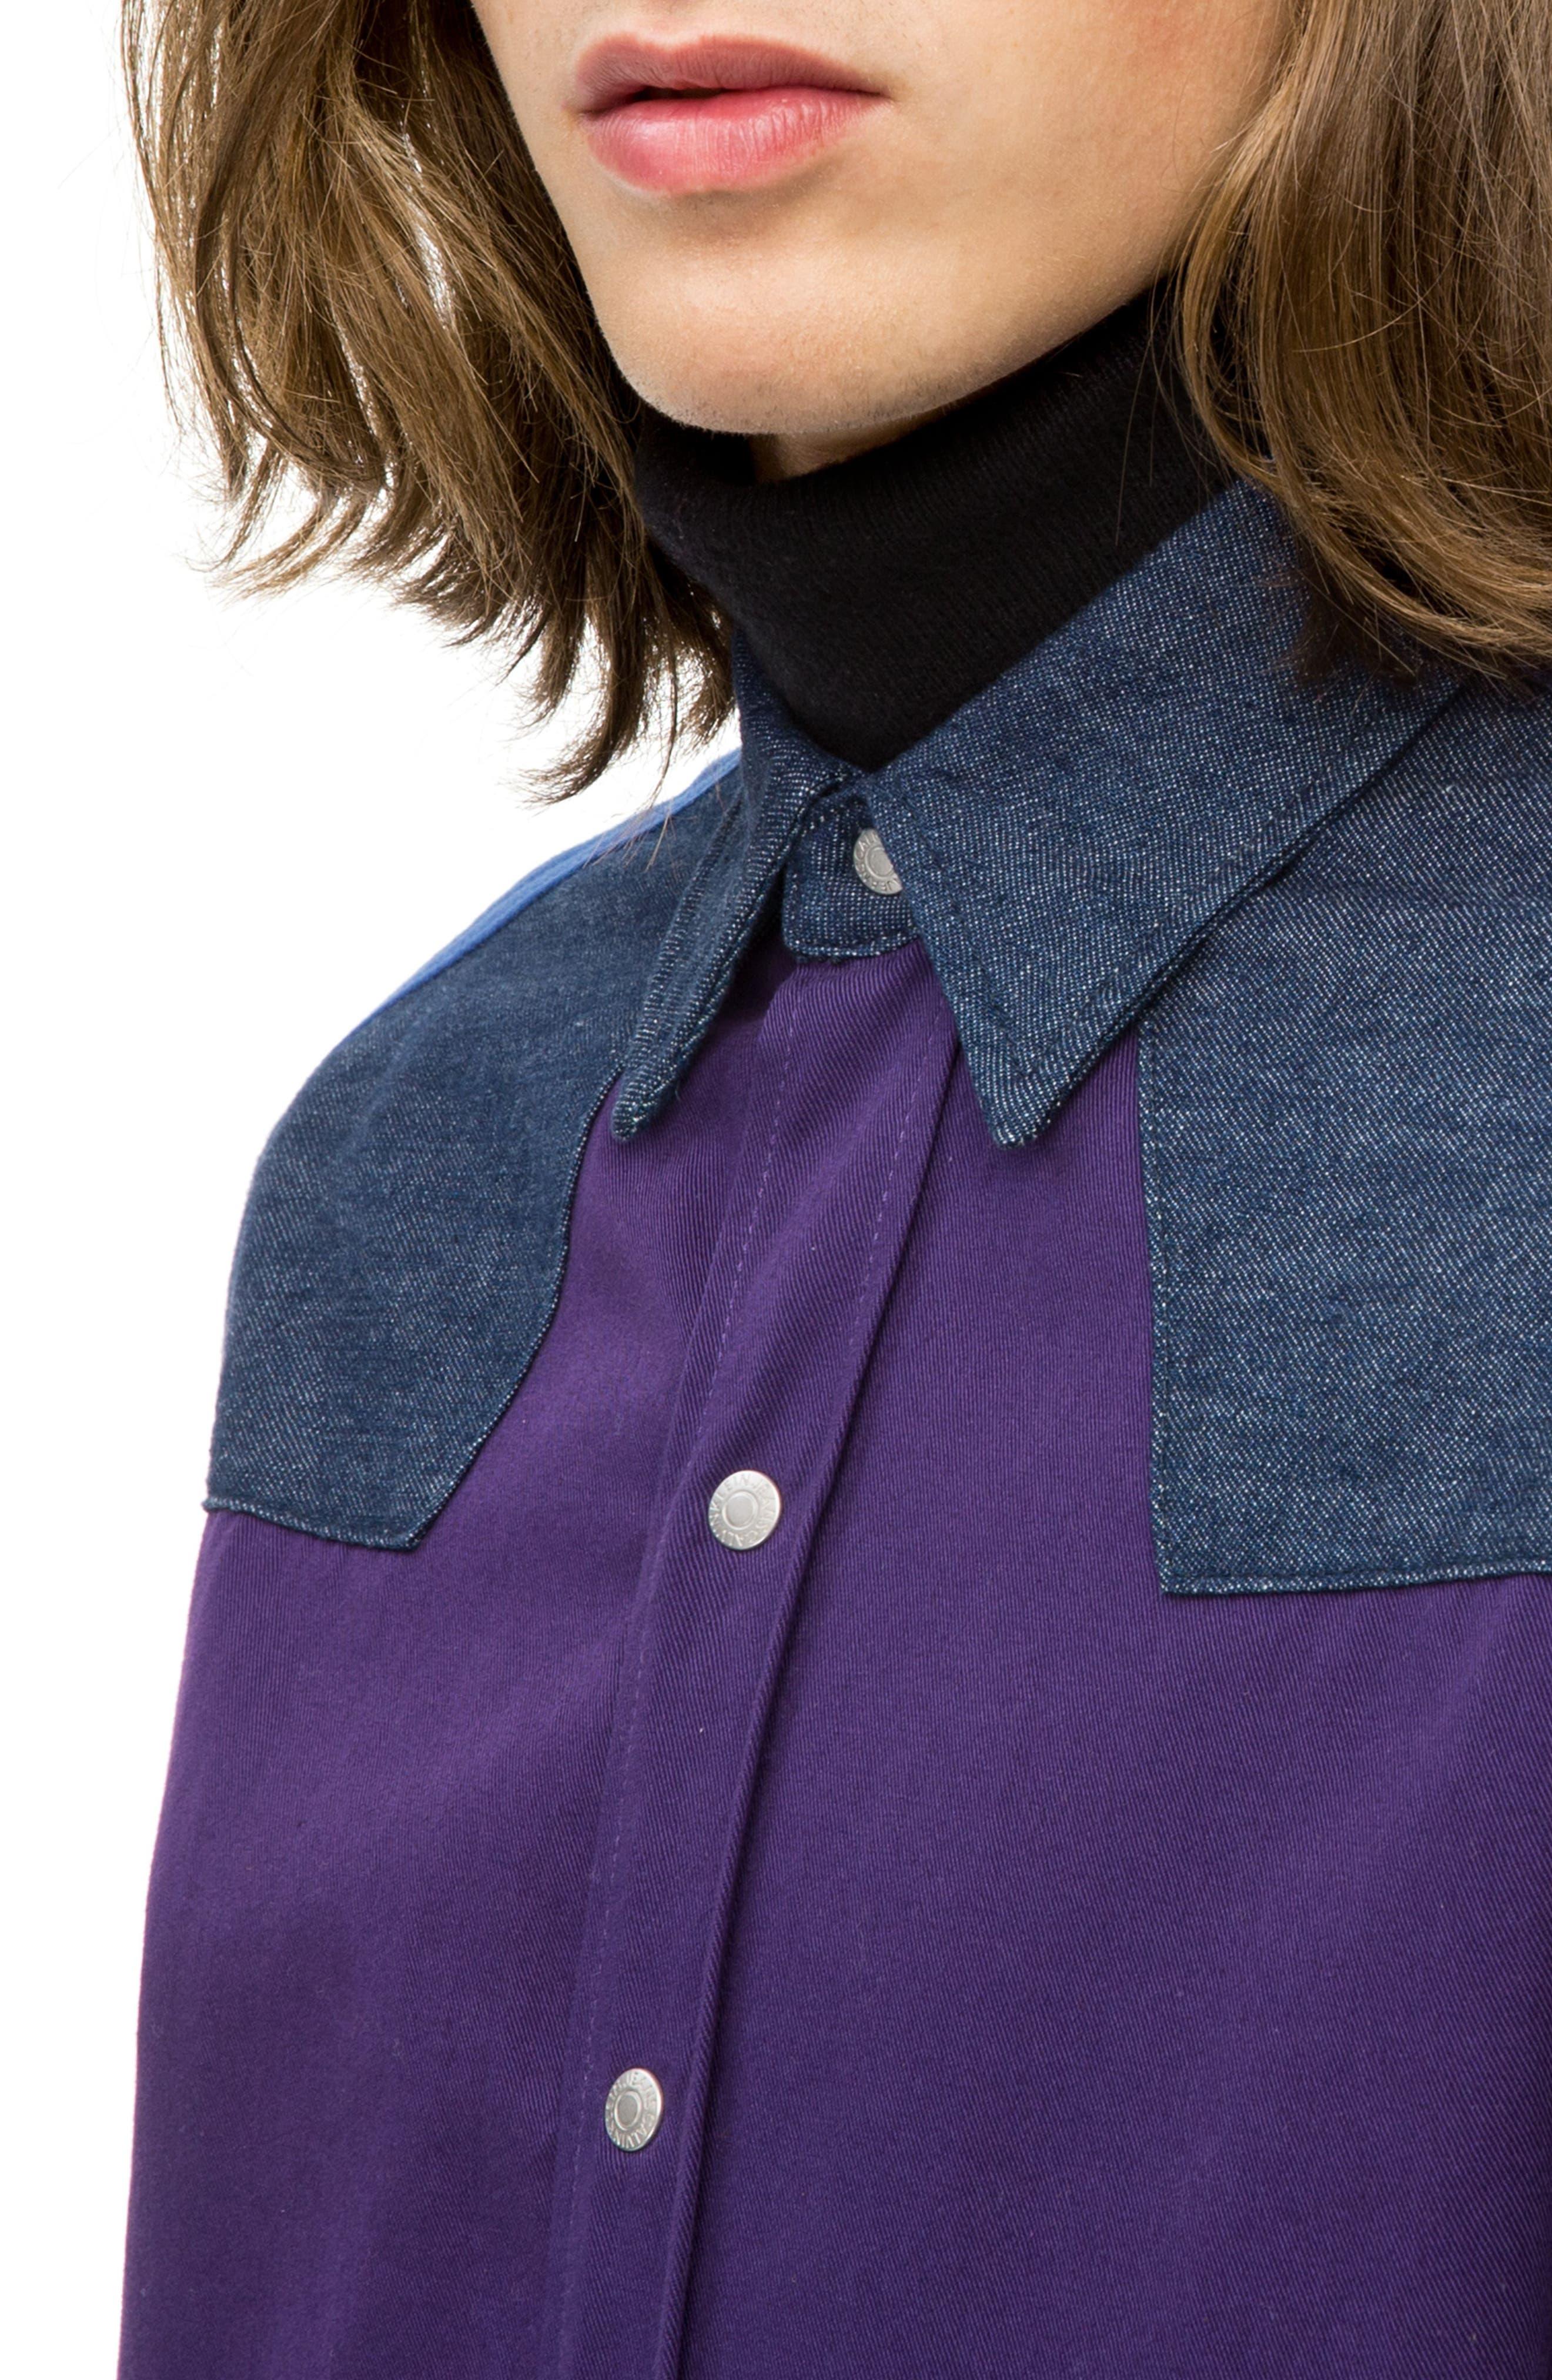 Calvin Klein Colorblock Western Shirt,                             Alternate thumbnail 2, color,                             OLIVIA RINSE